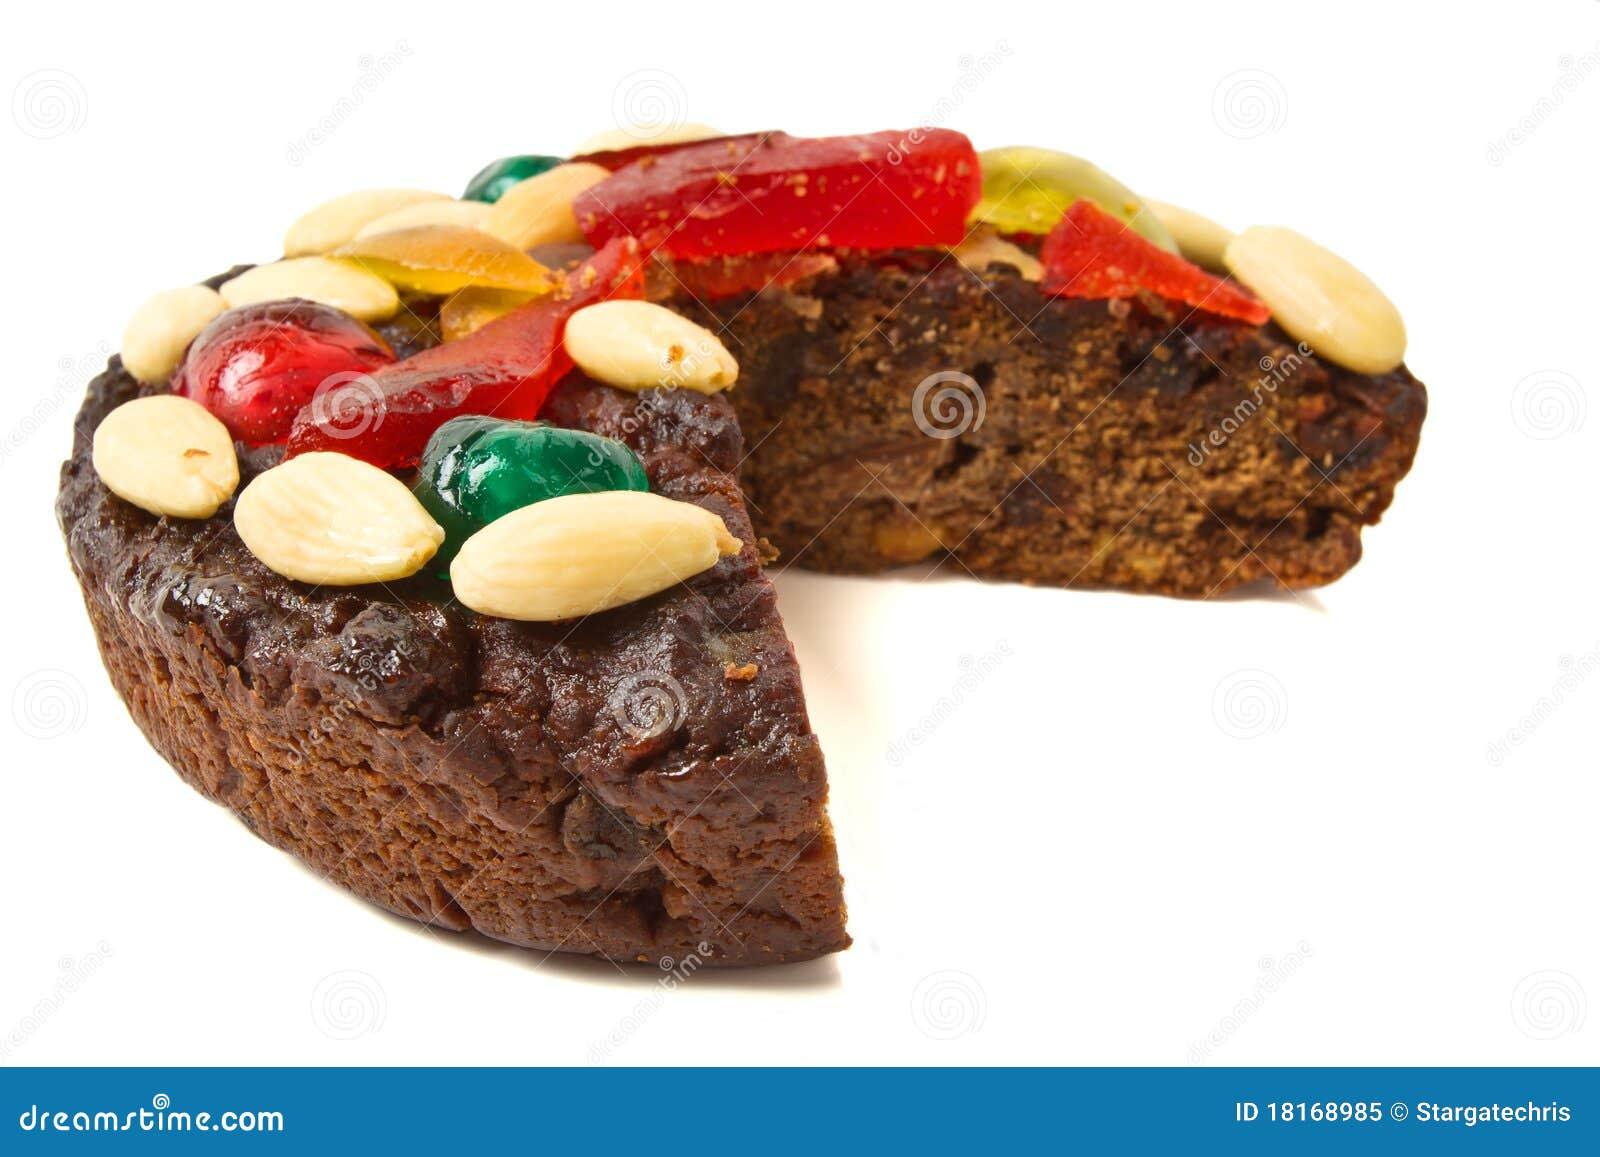 schokoladen frucht kuchen lizenzfreies stockfoto bild. Black Bedroom Furniture Sets. Home Design Ideas